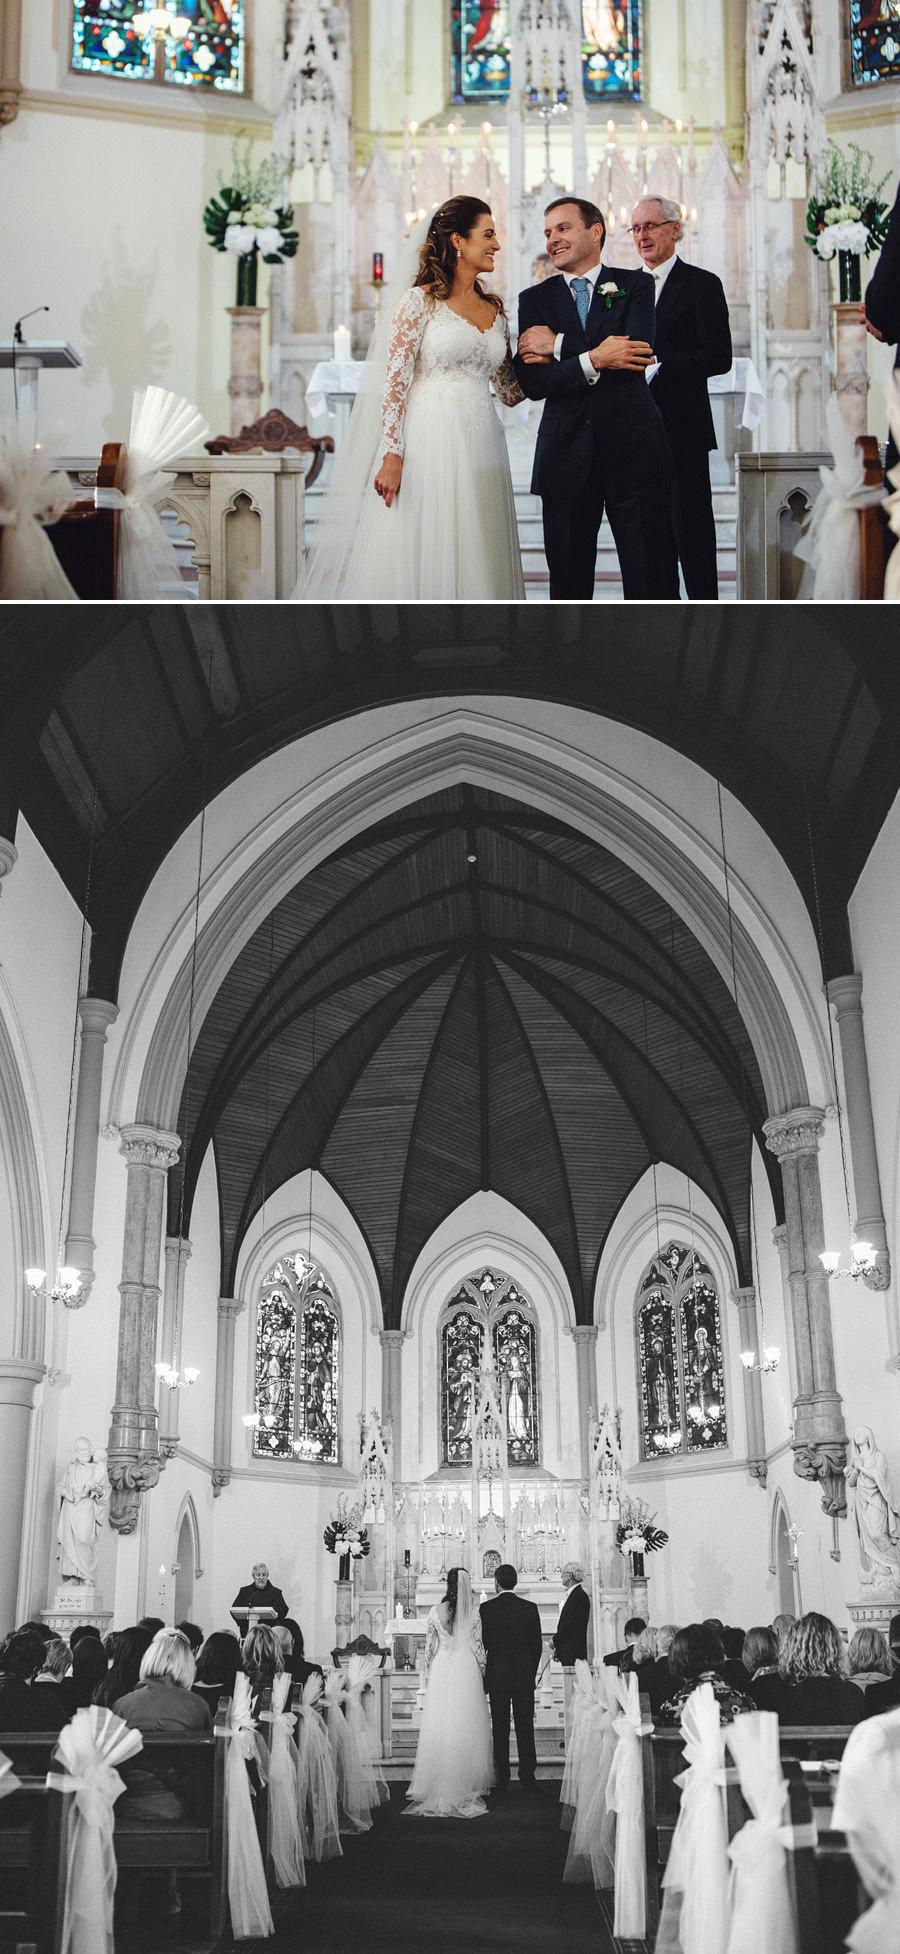 Timeless Wedding Photography: Ceremony